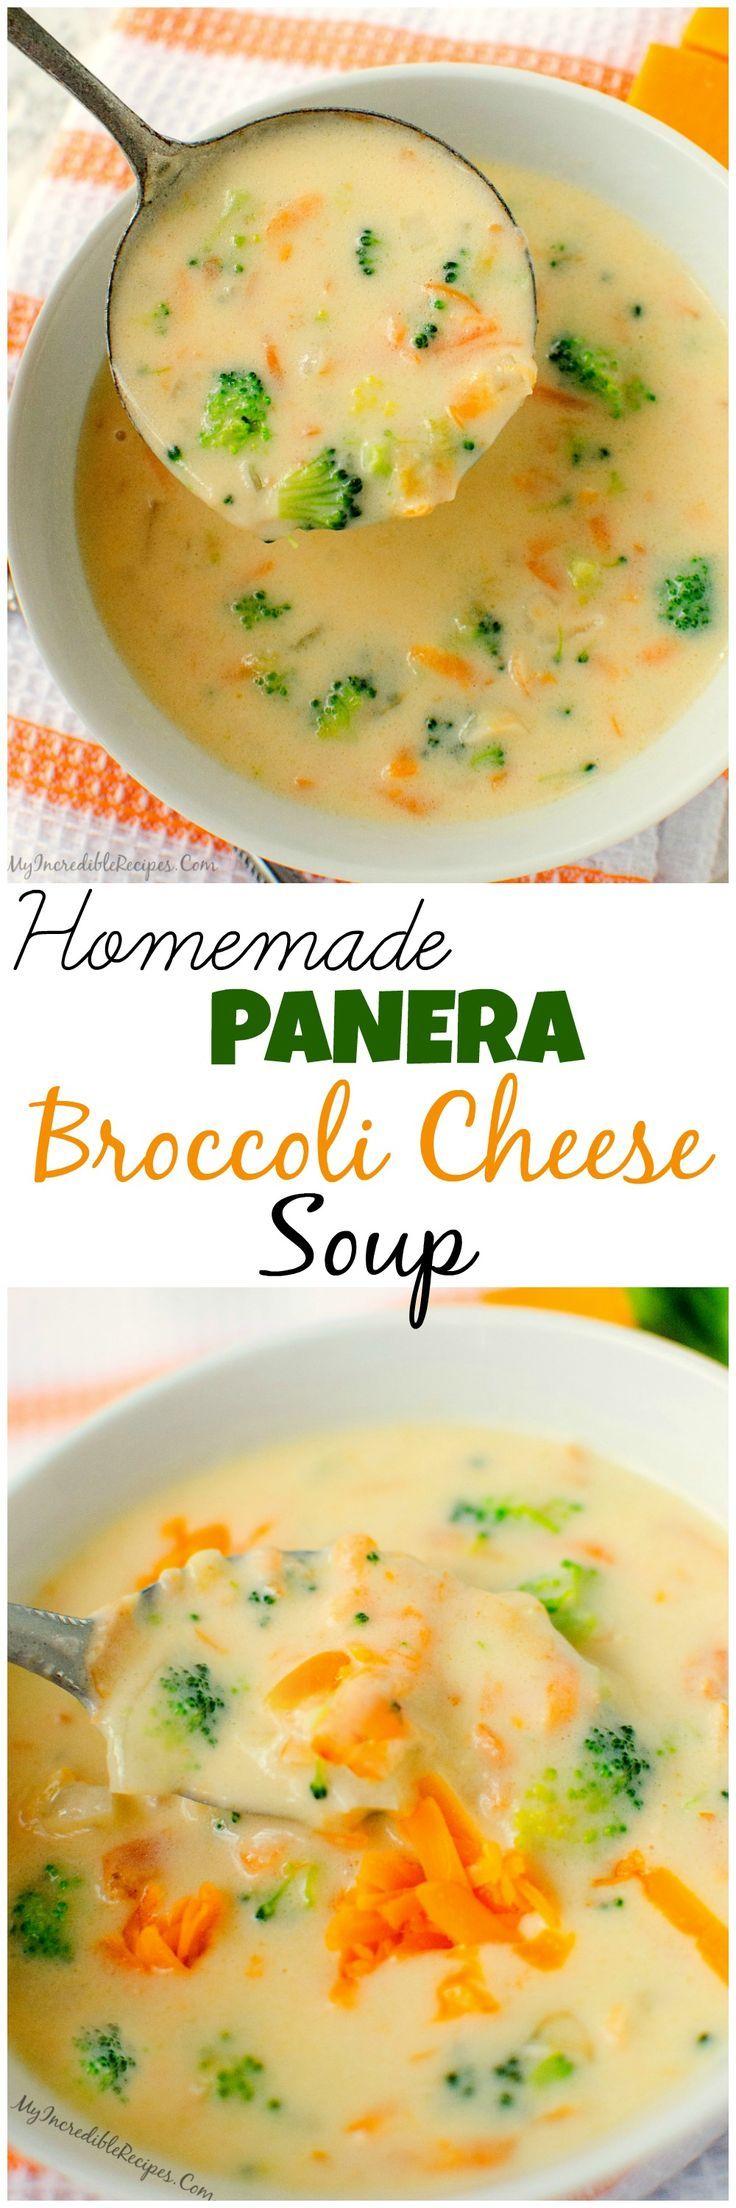 Homemade Panera Broccoli Cheese Soup!